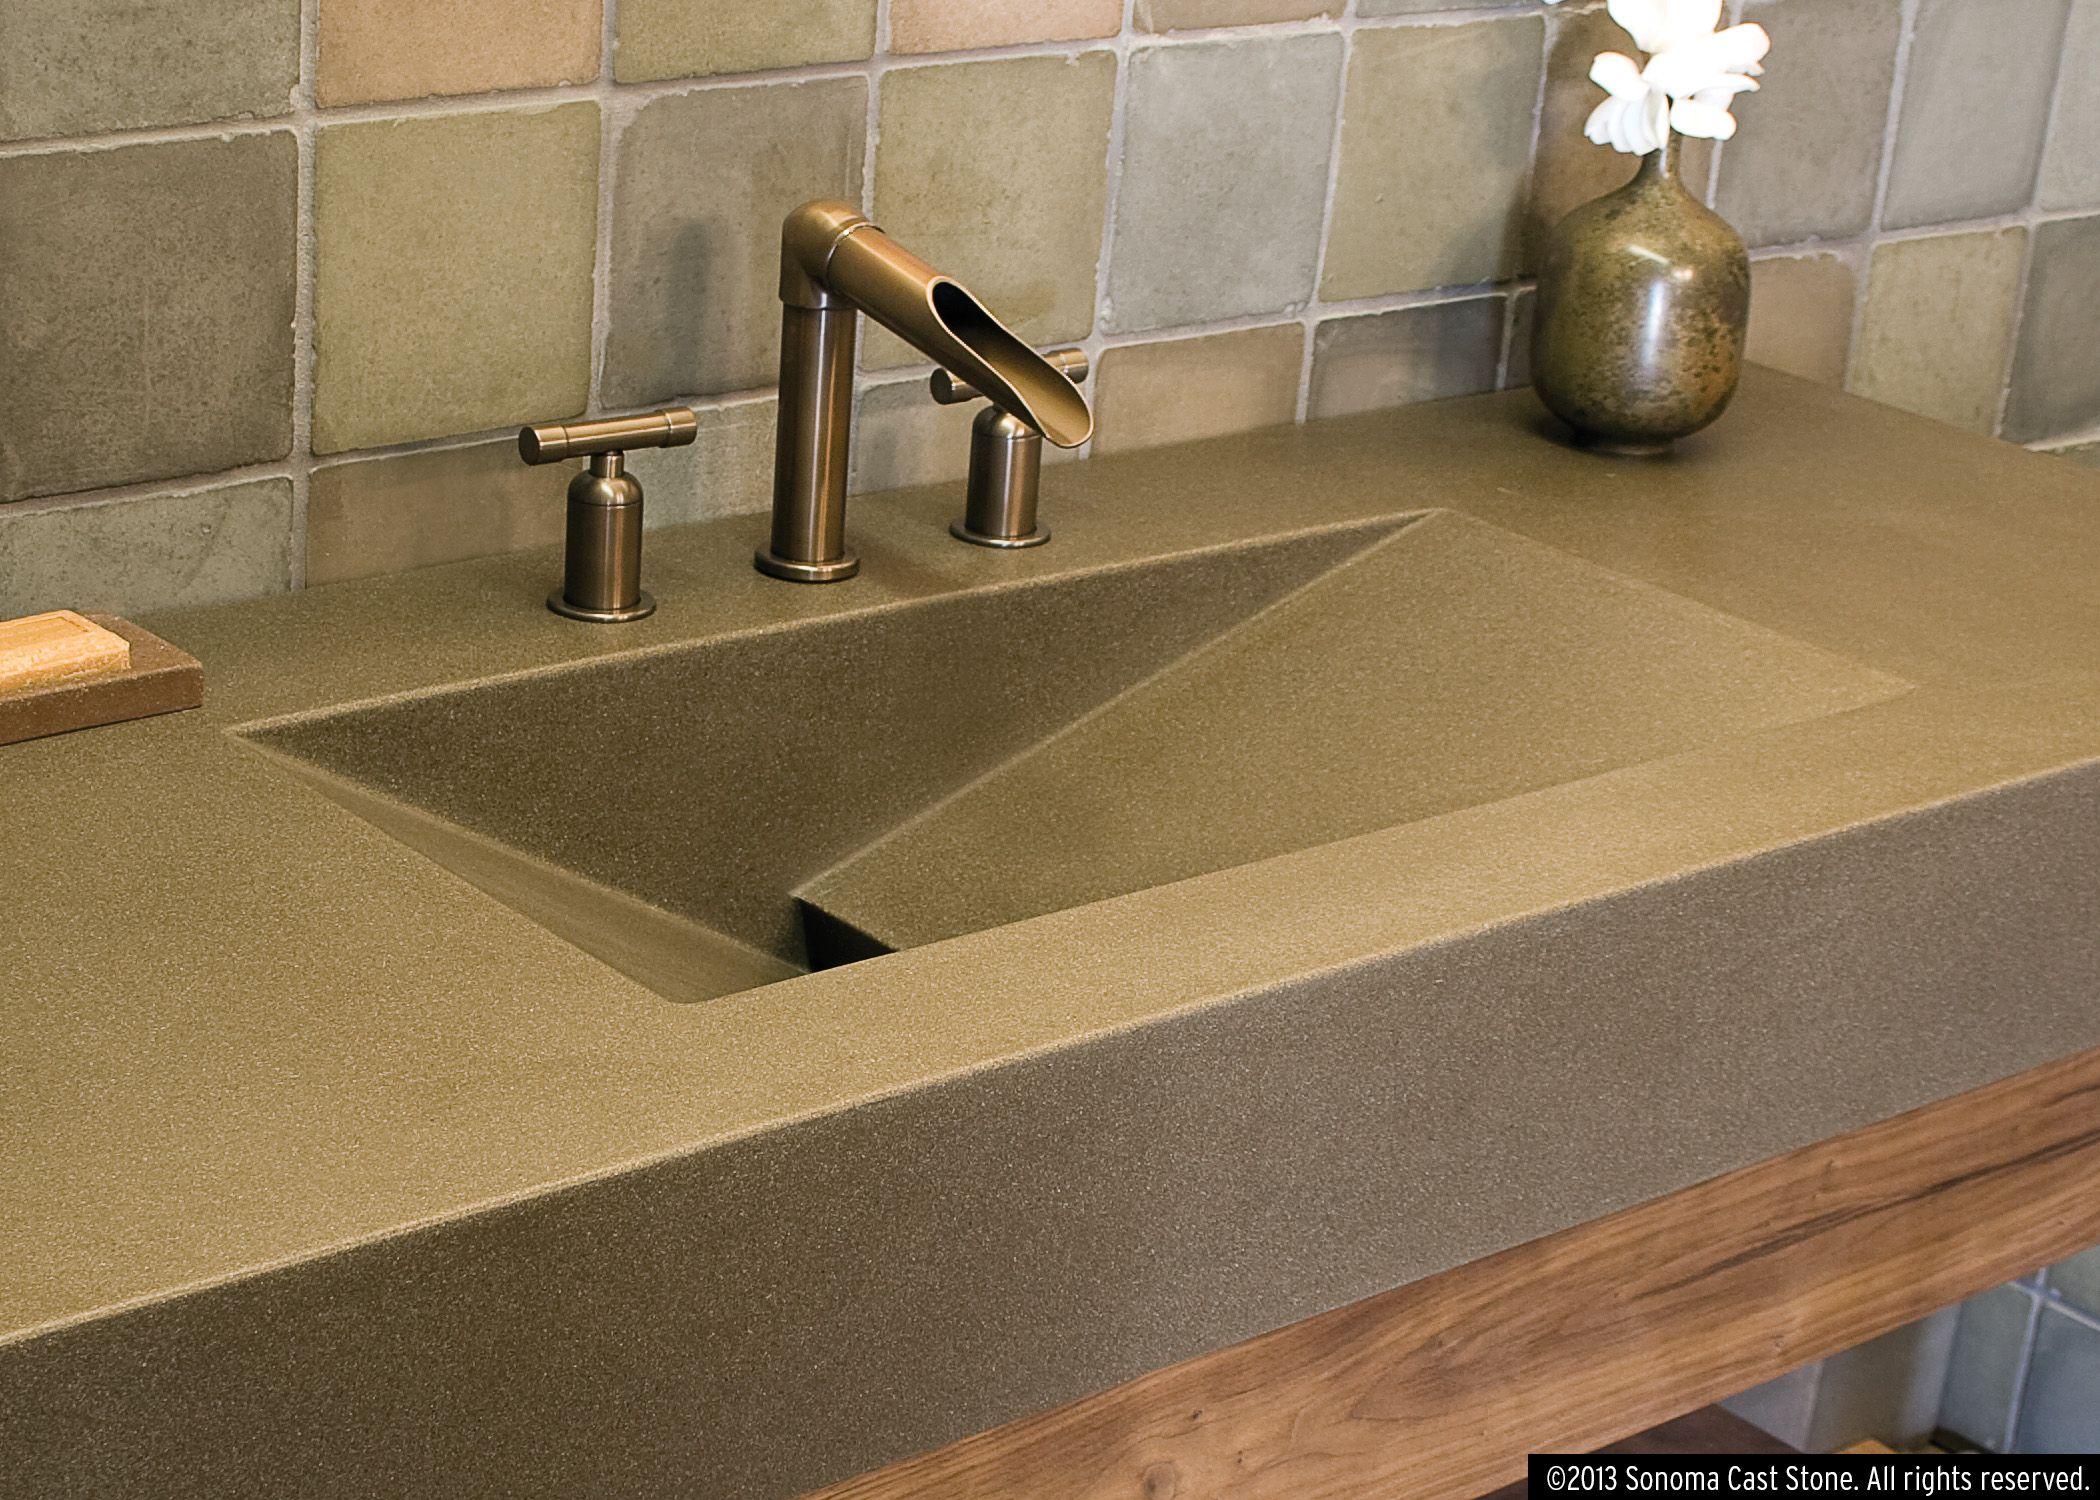 Concrete Sinks Ramp Sinks에 있는 핀